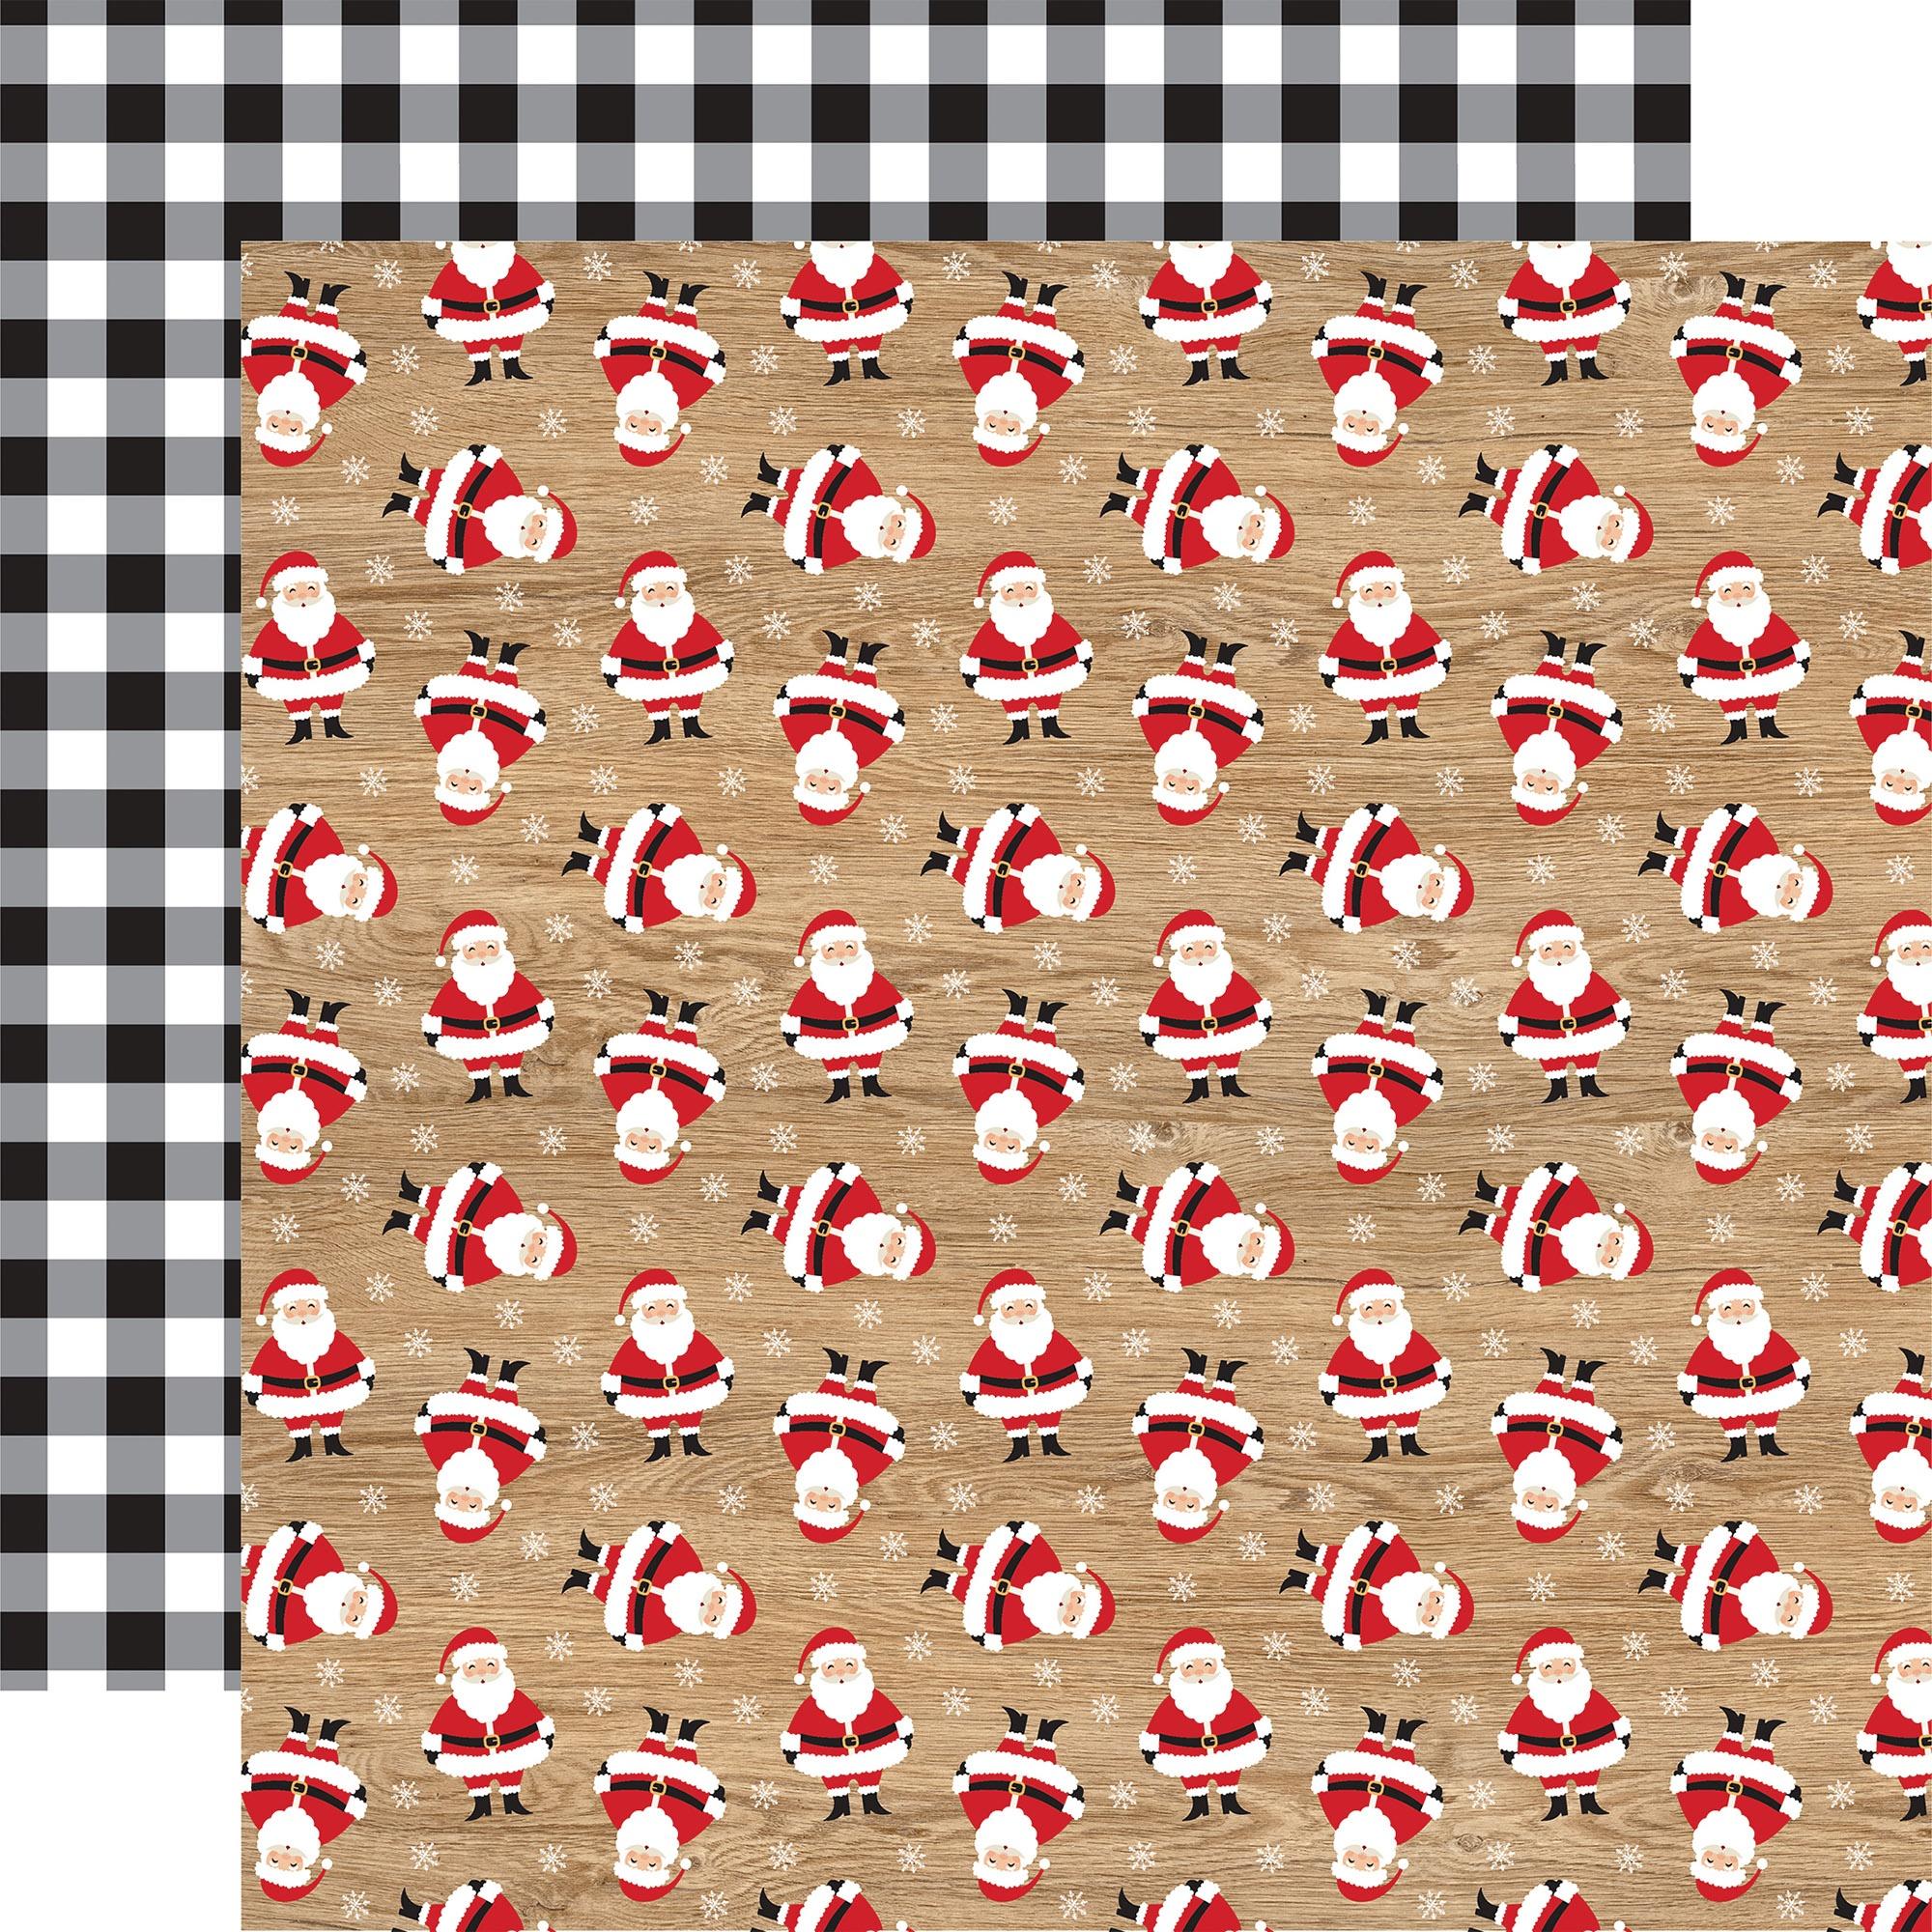 Echo Park - Jingle All The Way - KRIS KRINGLE - 12x12 Double-Sided Paper